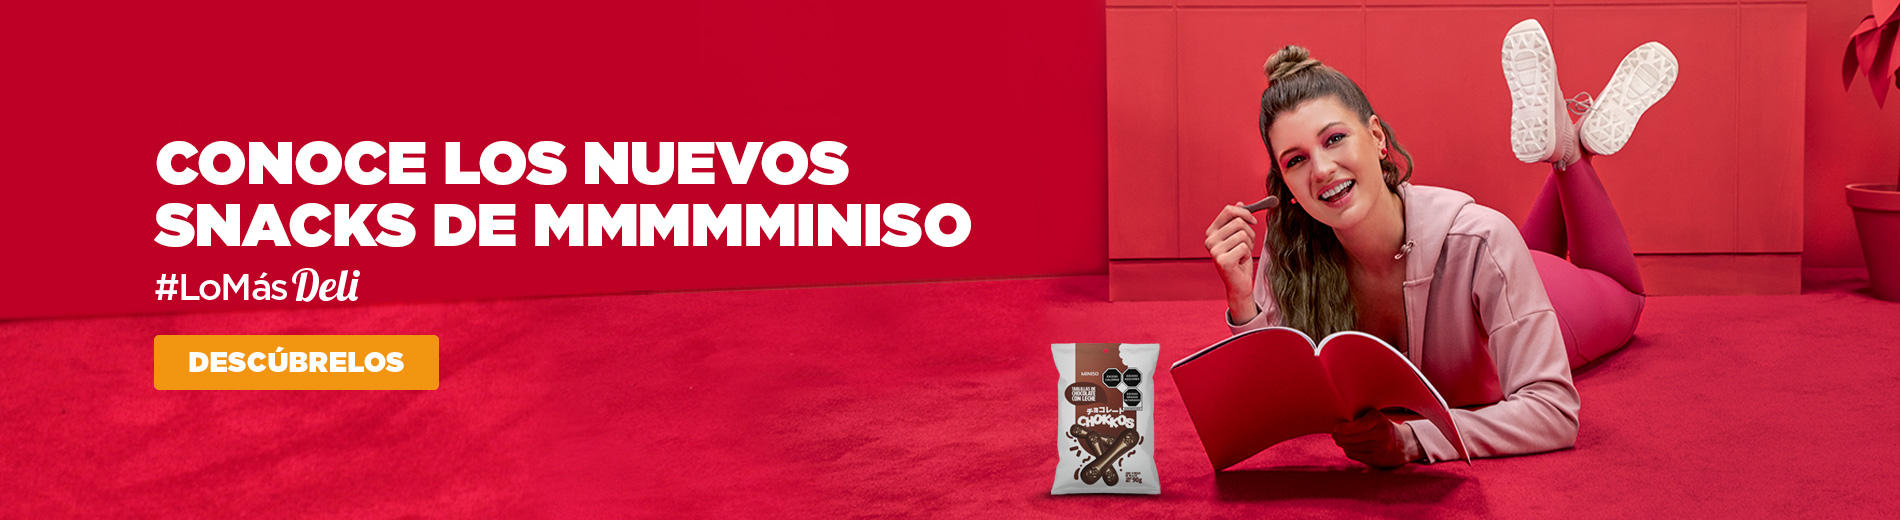 Snacks en Miniso